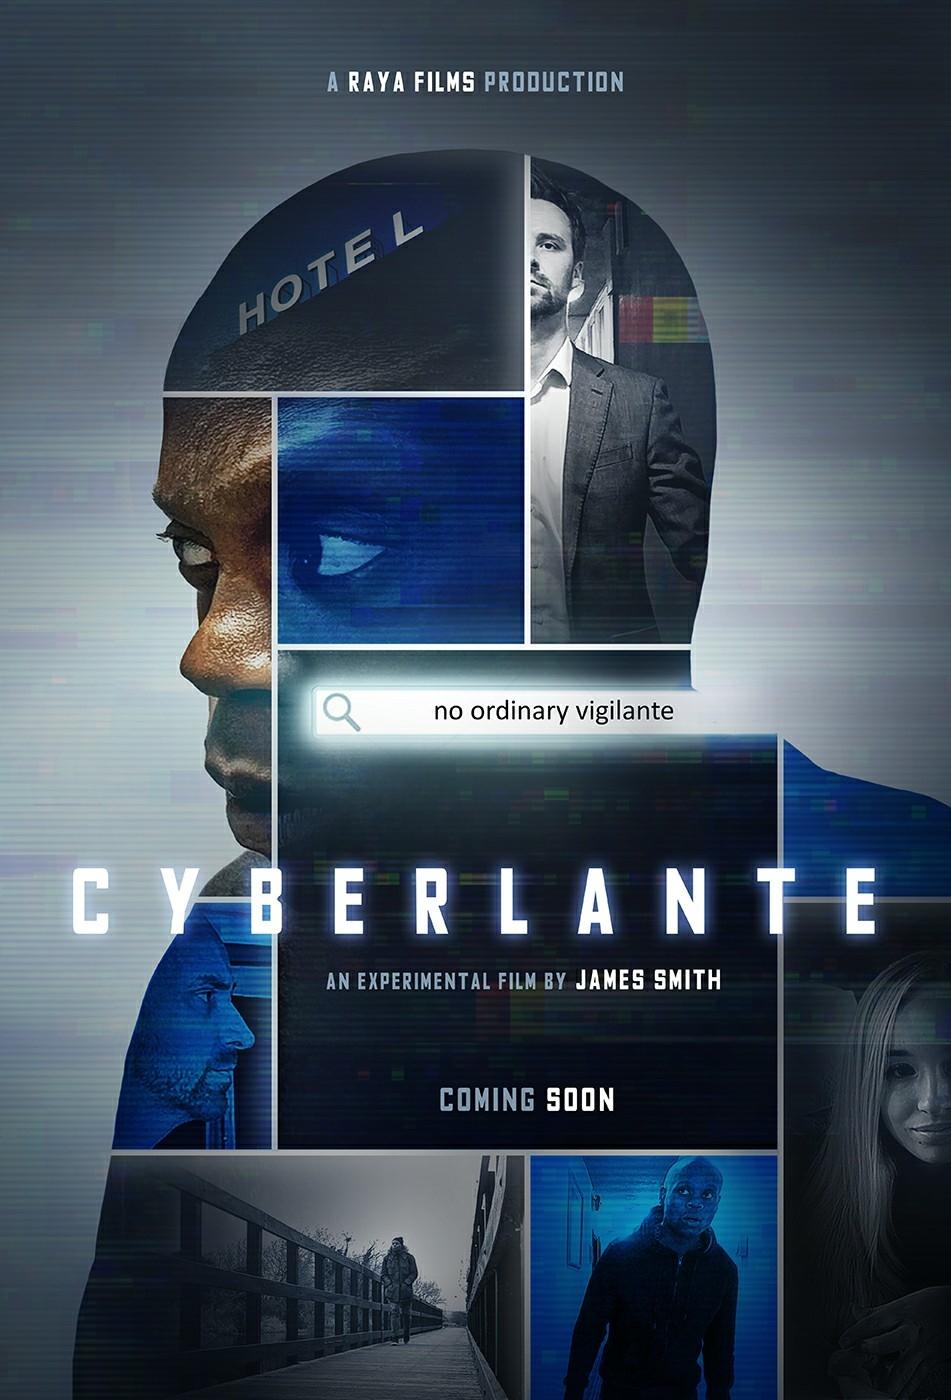 Cyberlante film poster (credit: David Ward)